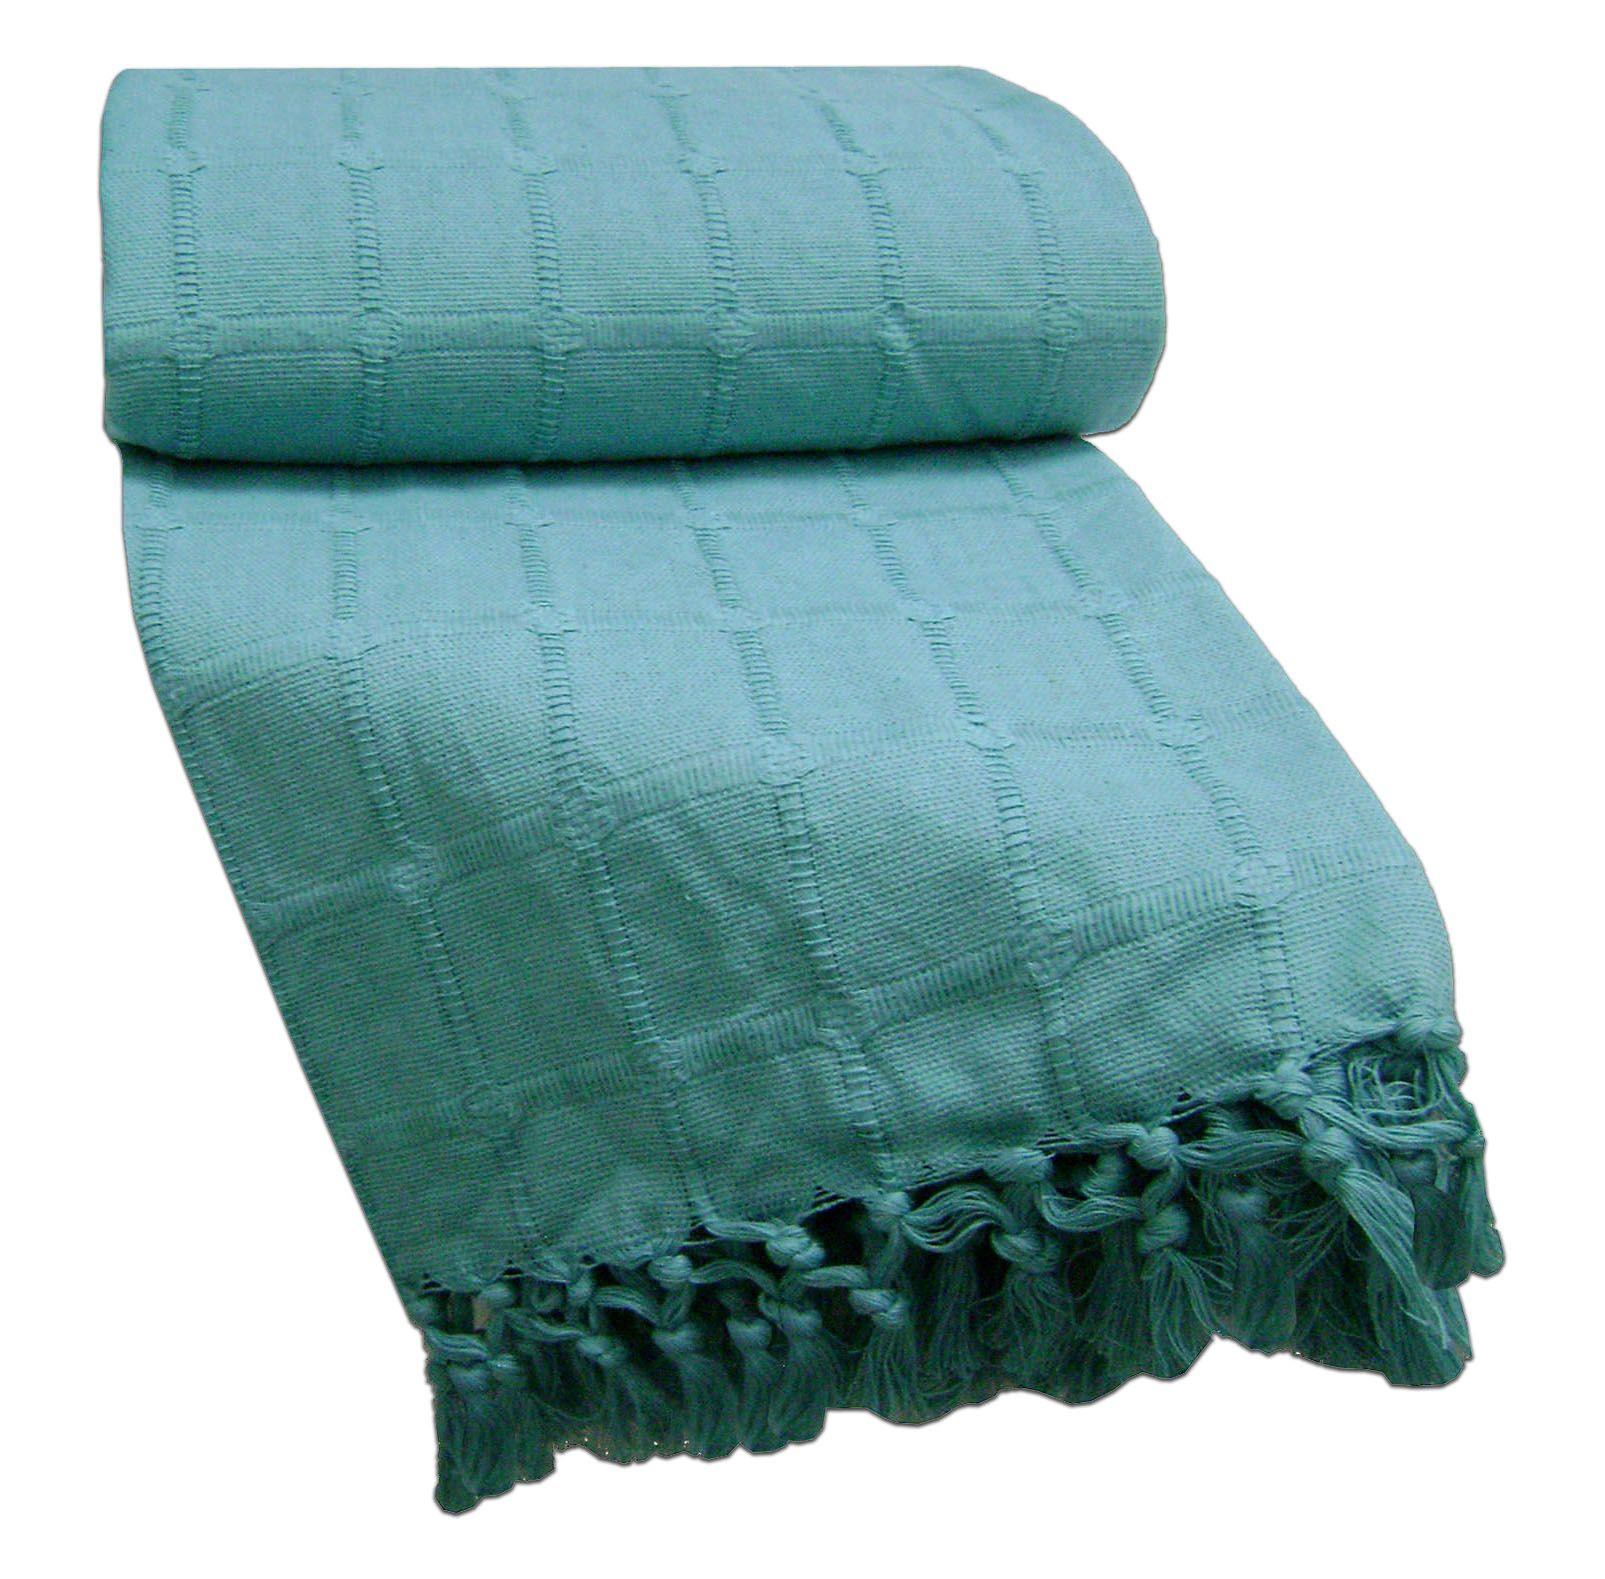 100 Cotton Bed Sofa Throw 150x200CmsFits 2 Seater Sofa